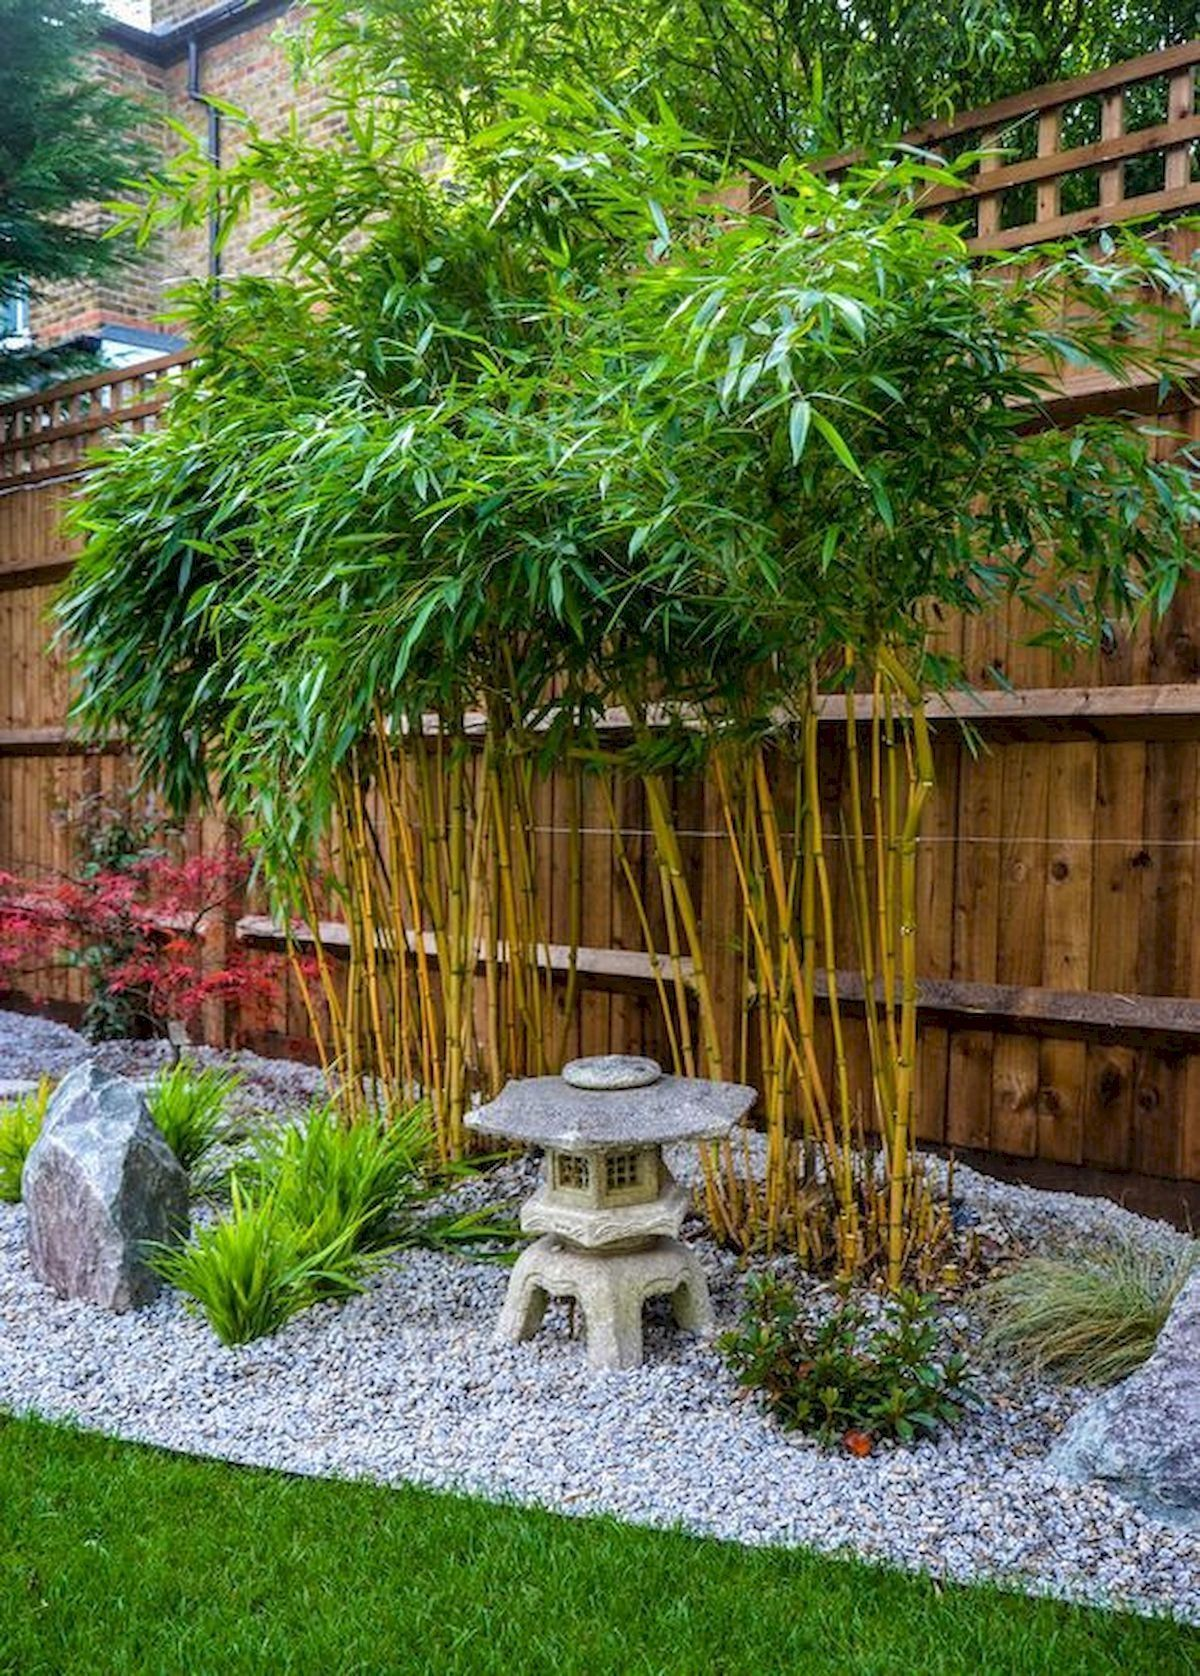 80 Wonderful Side Yard And Backyard Japanese Garden Design Ideas 11 In 2020 Japanese Garden Small Japanese Garden Japanese Garden Backyard